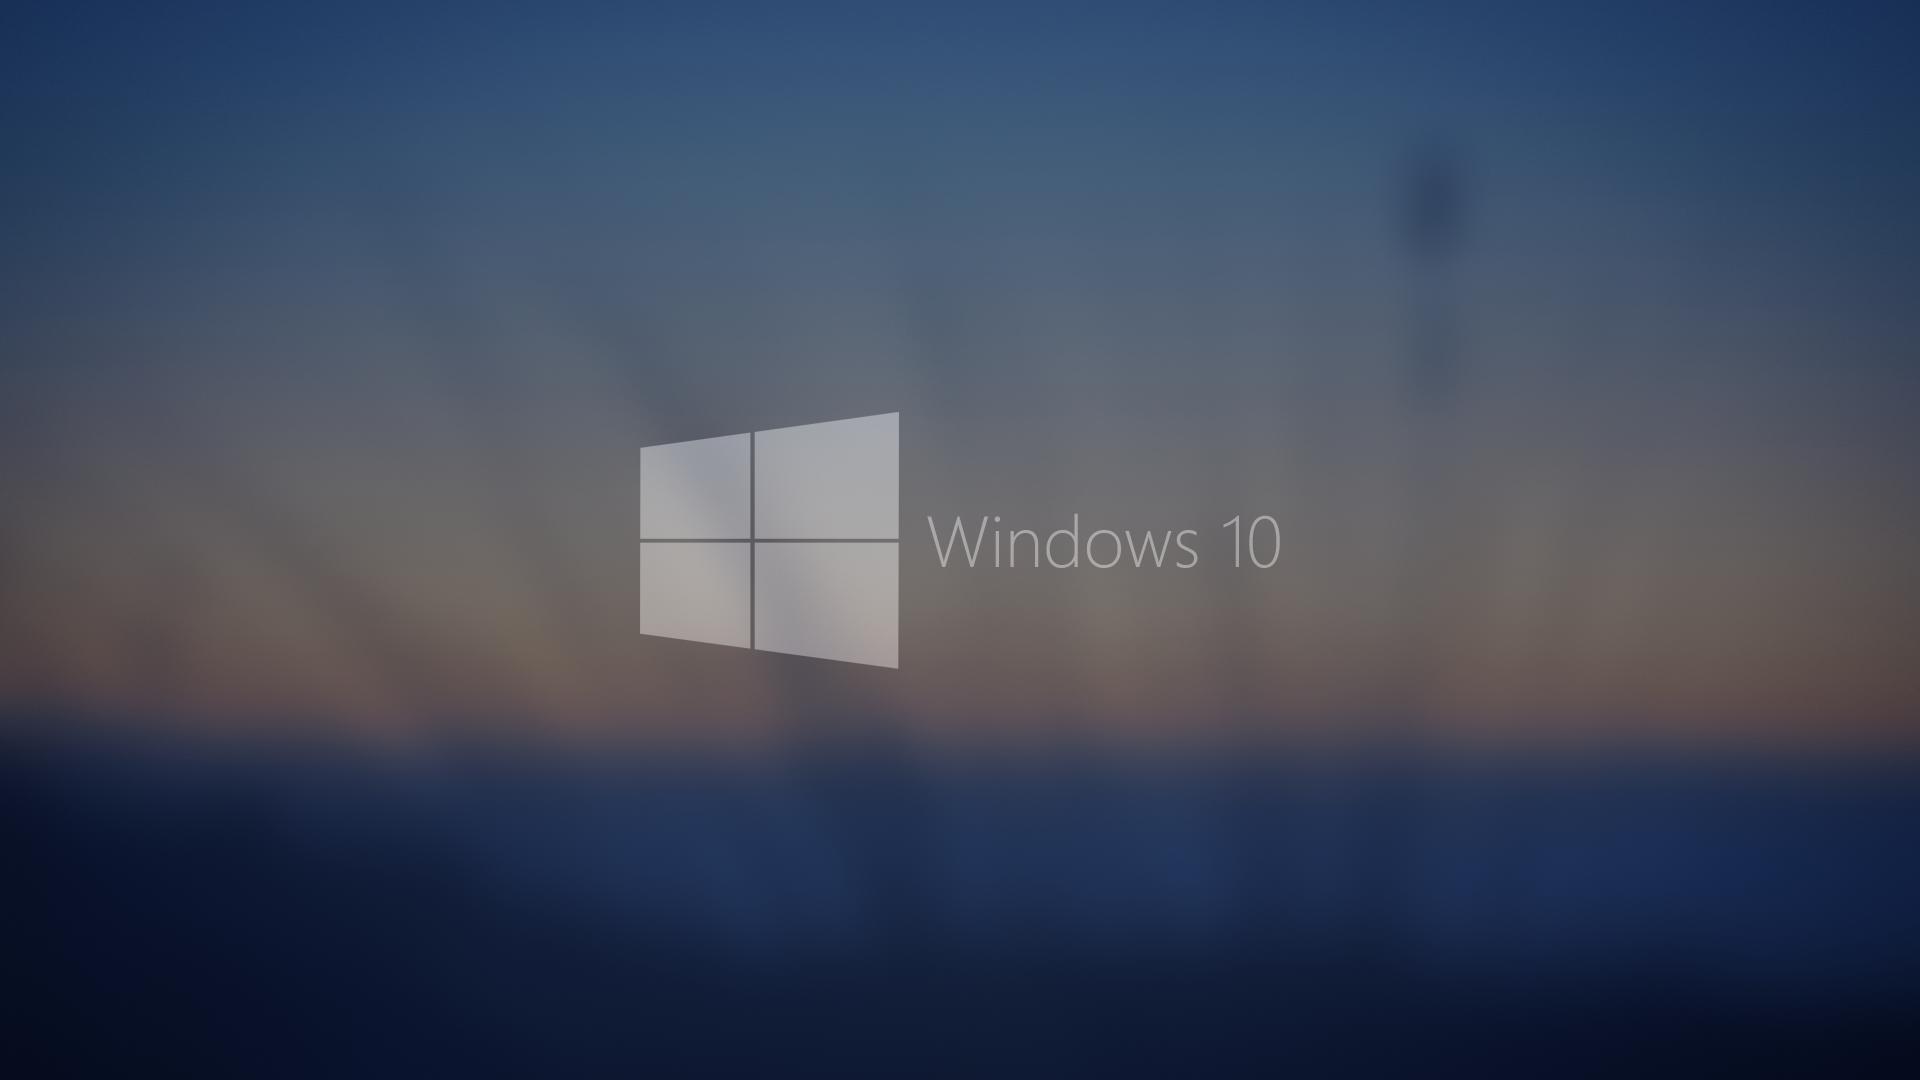 Windows 10 Hd Wallpaper Background Image 1920x1080 Id637159